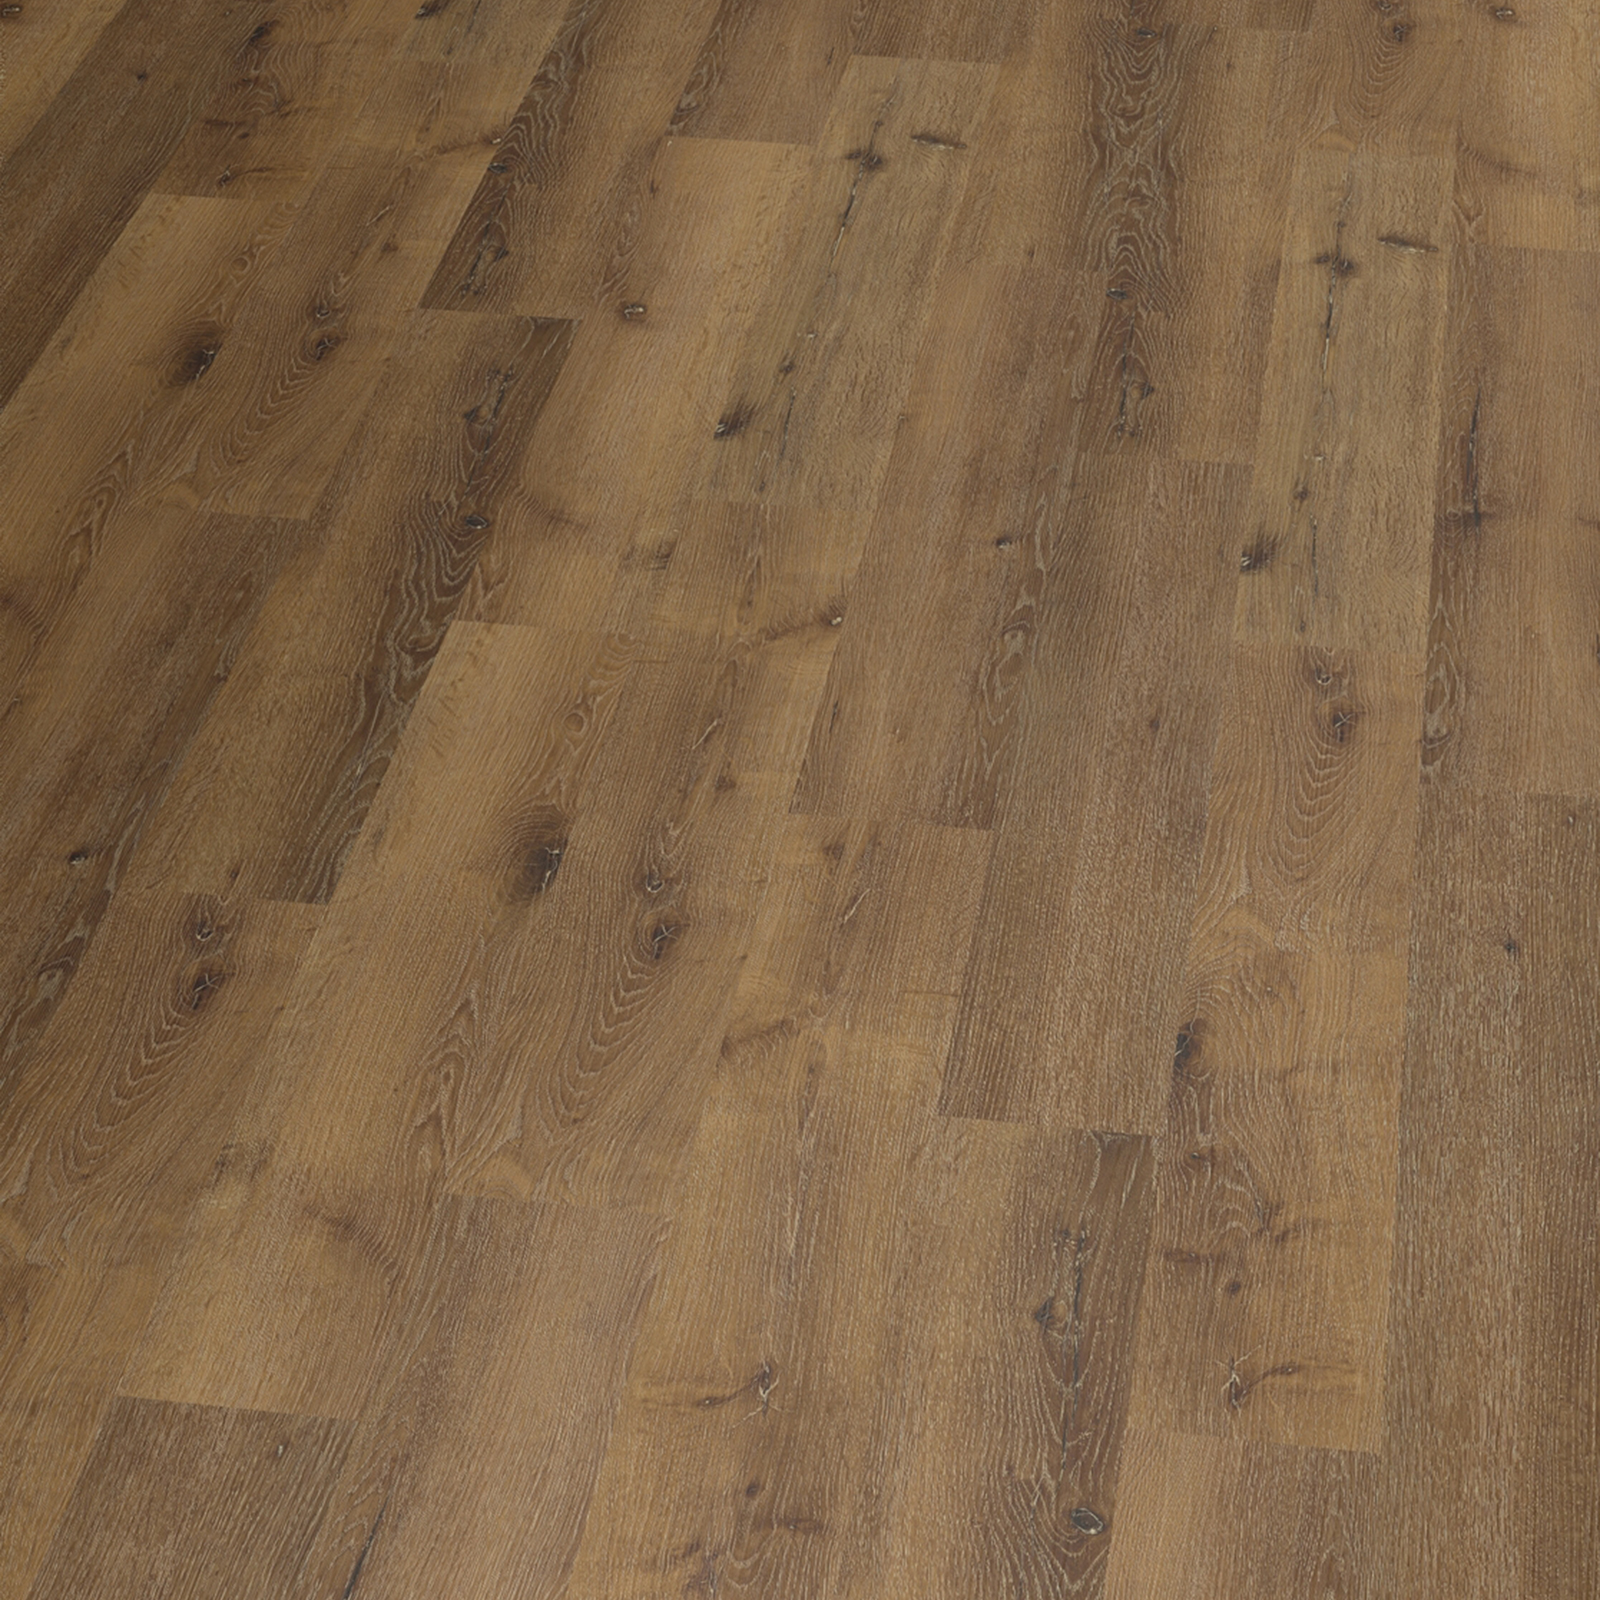 Vinylboden PVC Klick Bodenbelag Eiche Basic Nürnberg rustik Dämmung Leisten